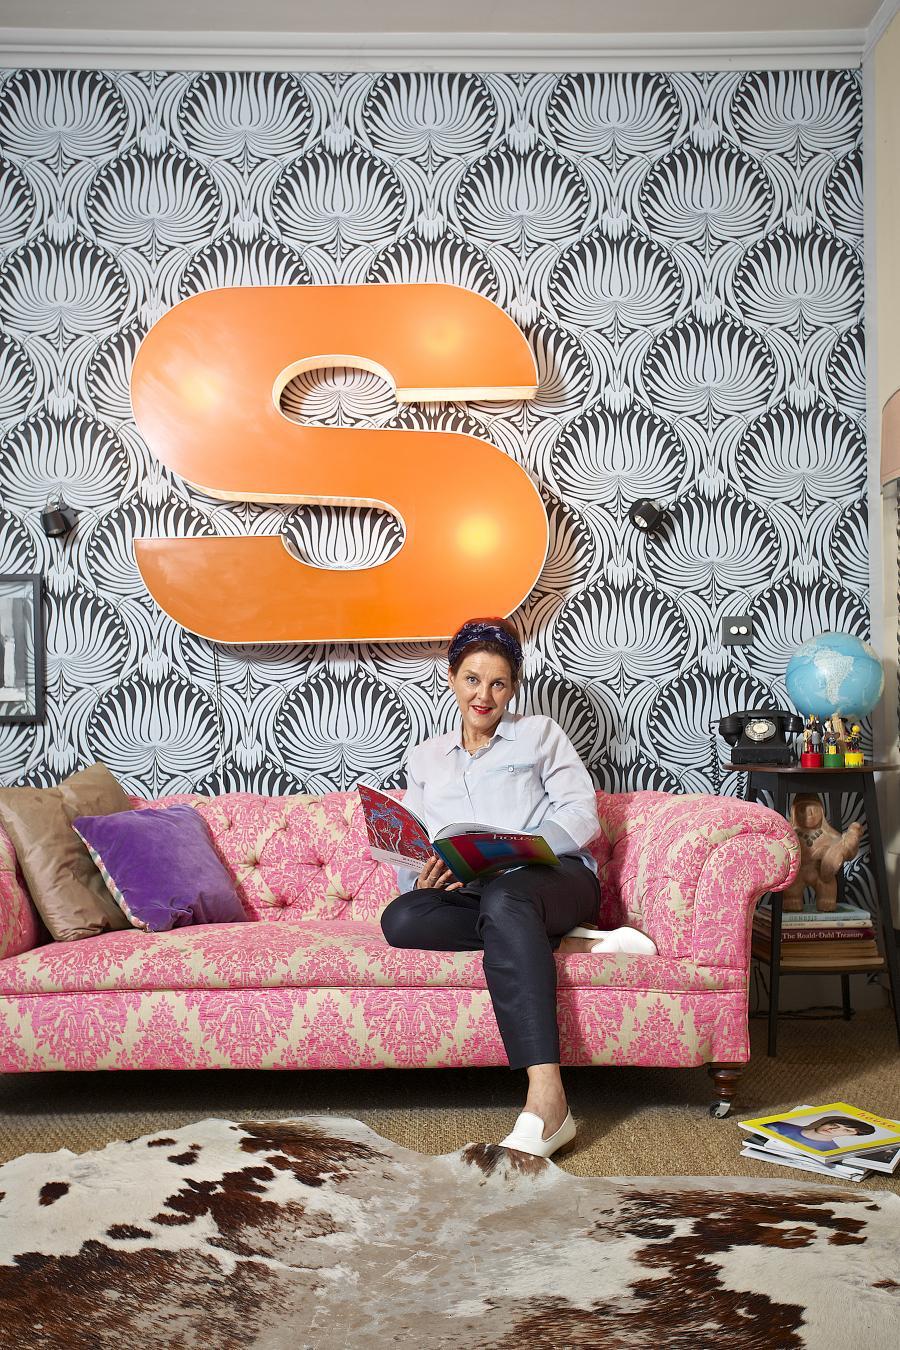 Colour Consultant Joa Studholme. Image via Evening Standard